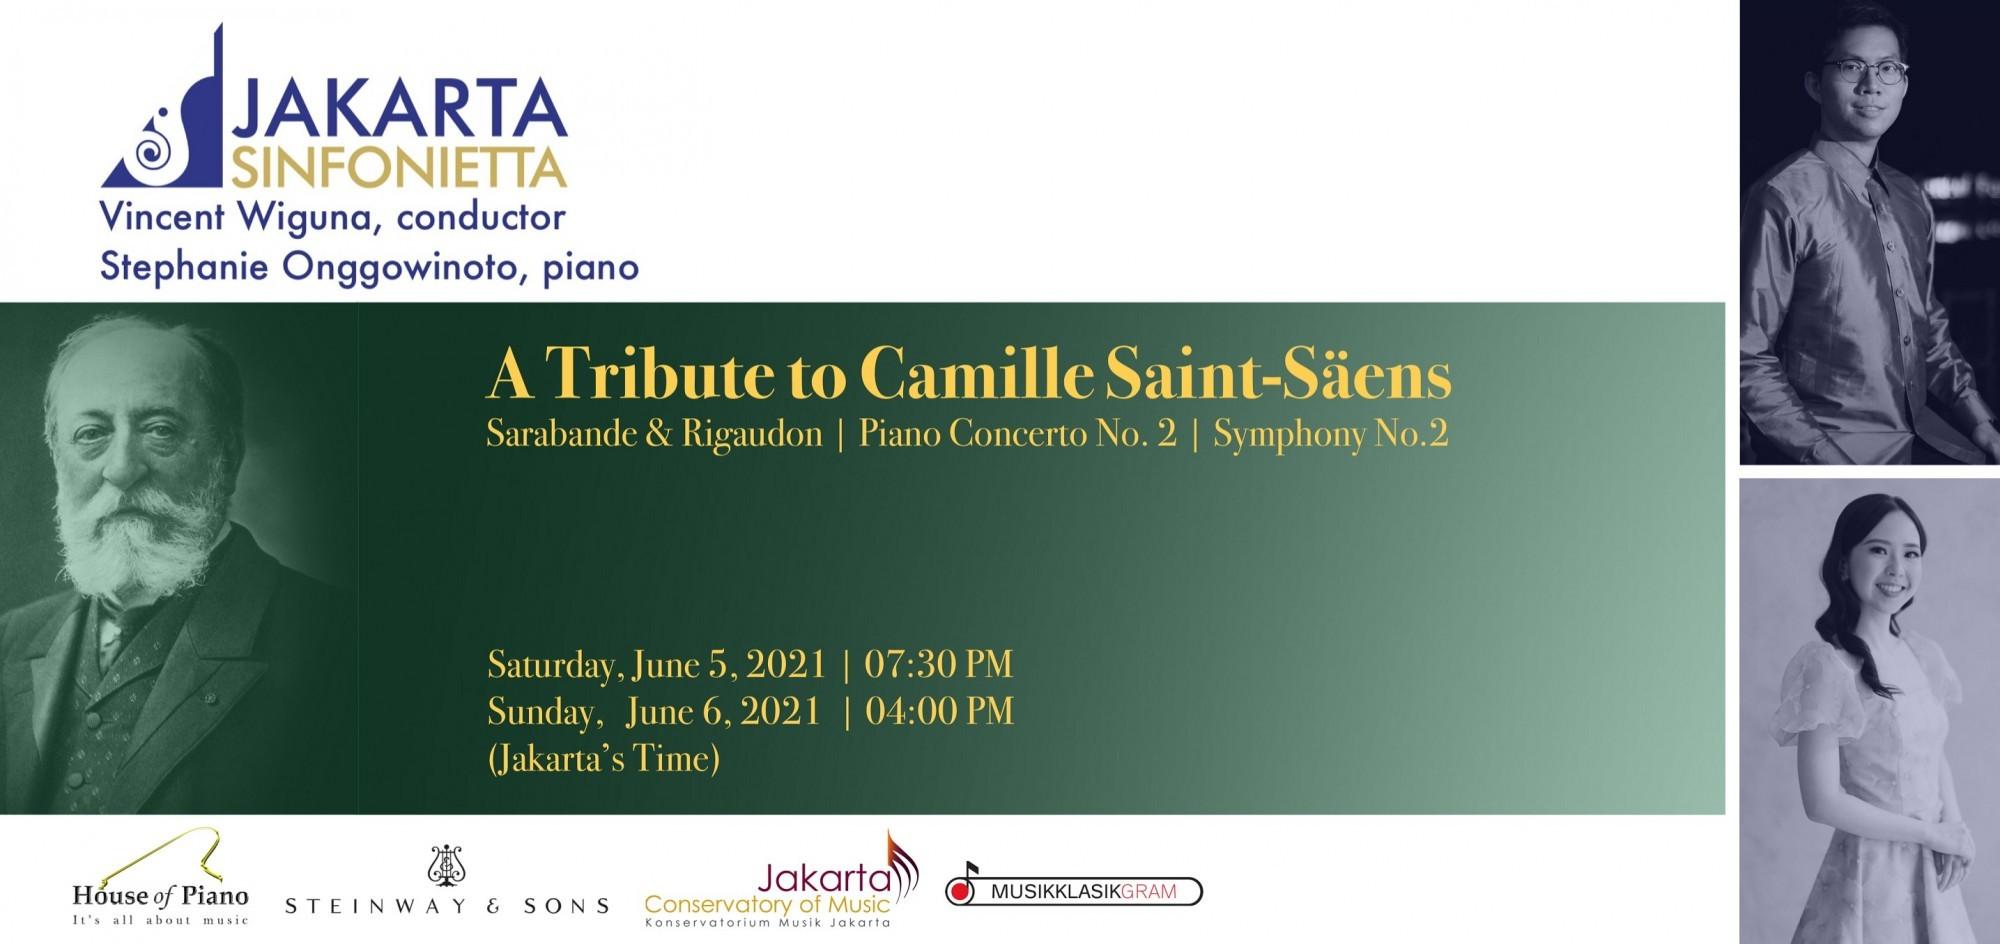 Jakarta Sinfonietta & Stephanie Onggowinoto: A Tribute to Camille Saint-Saëns (05/06/21)